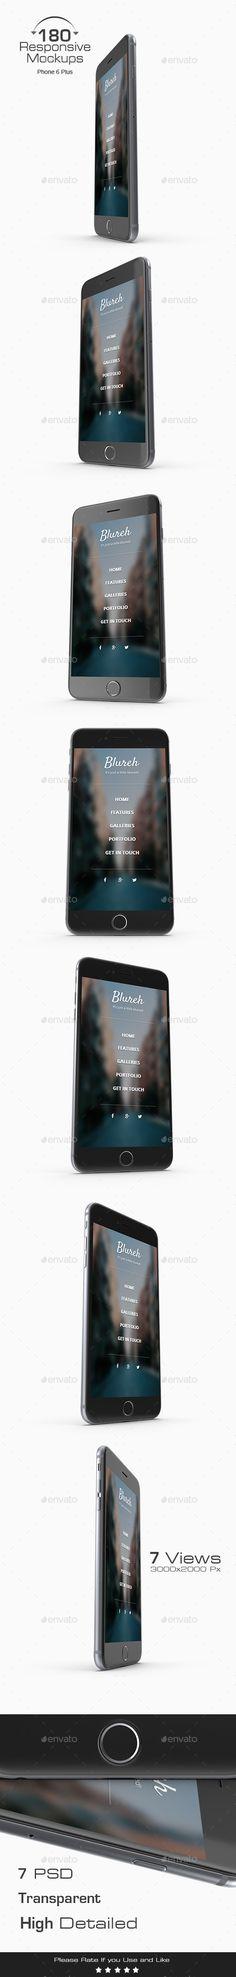 180 Responsive 3D Mockup - iPhone 6 Plus. Download here: http://graphicriver.net/item/180-responsive-3d-mockup-phone-6-plus/16493940?ref=ksioks